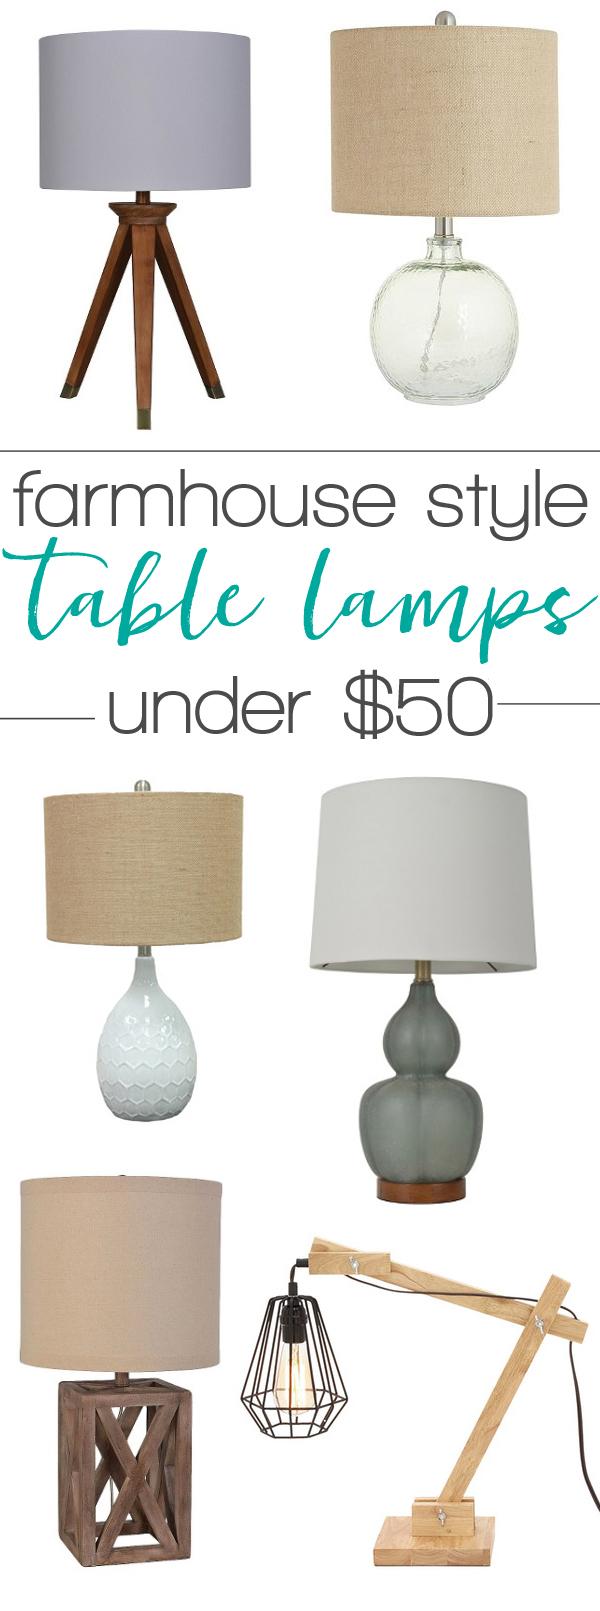 Farmhouse style lamps